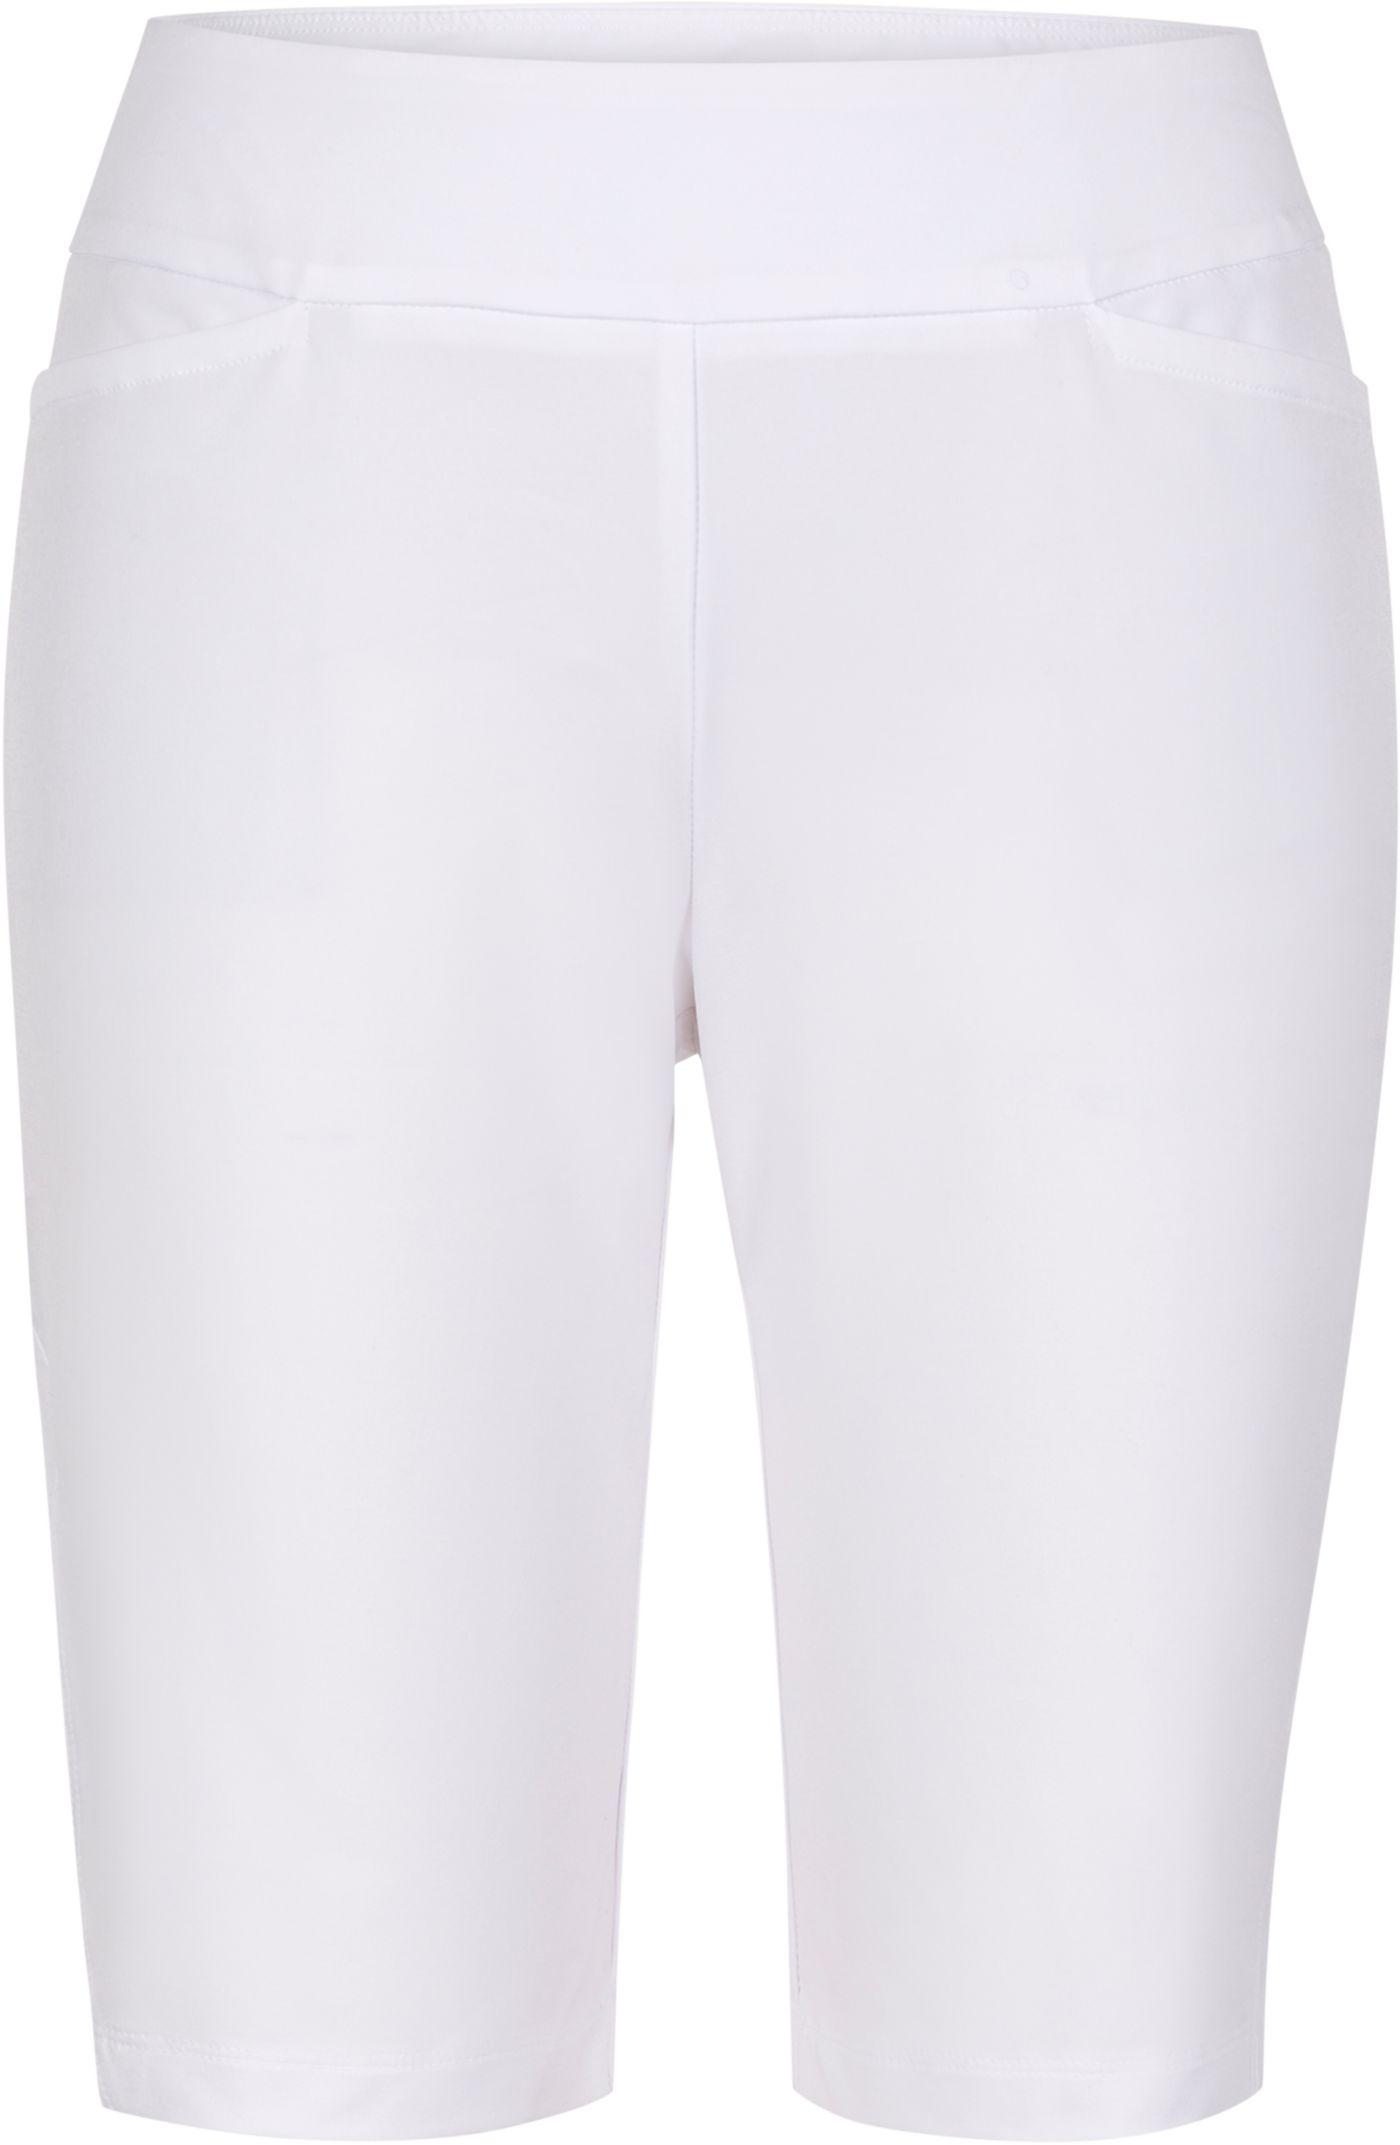 Tail Women's Essential Golf Shorts